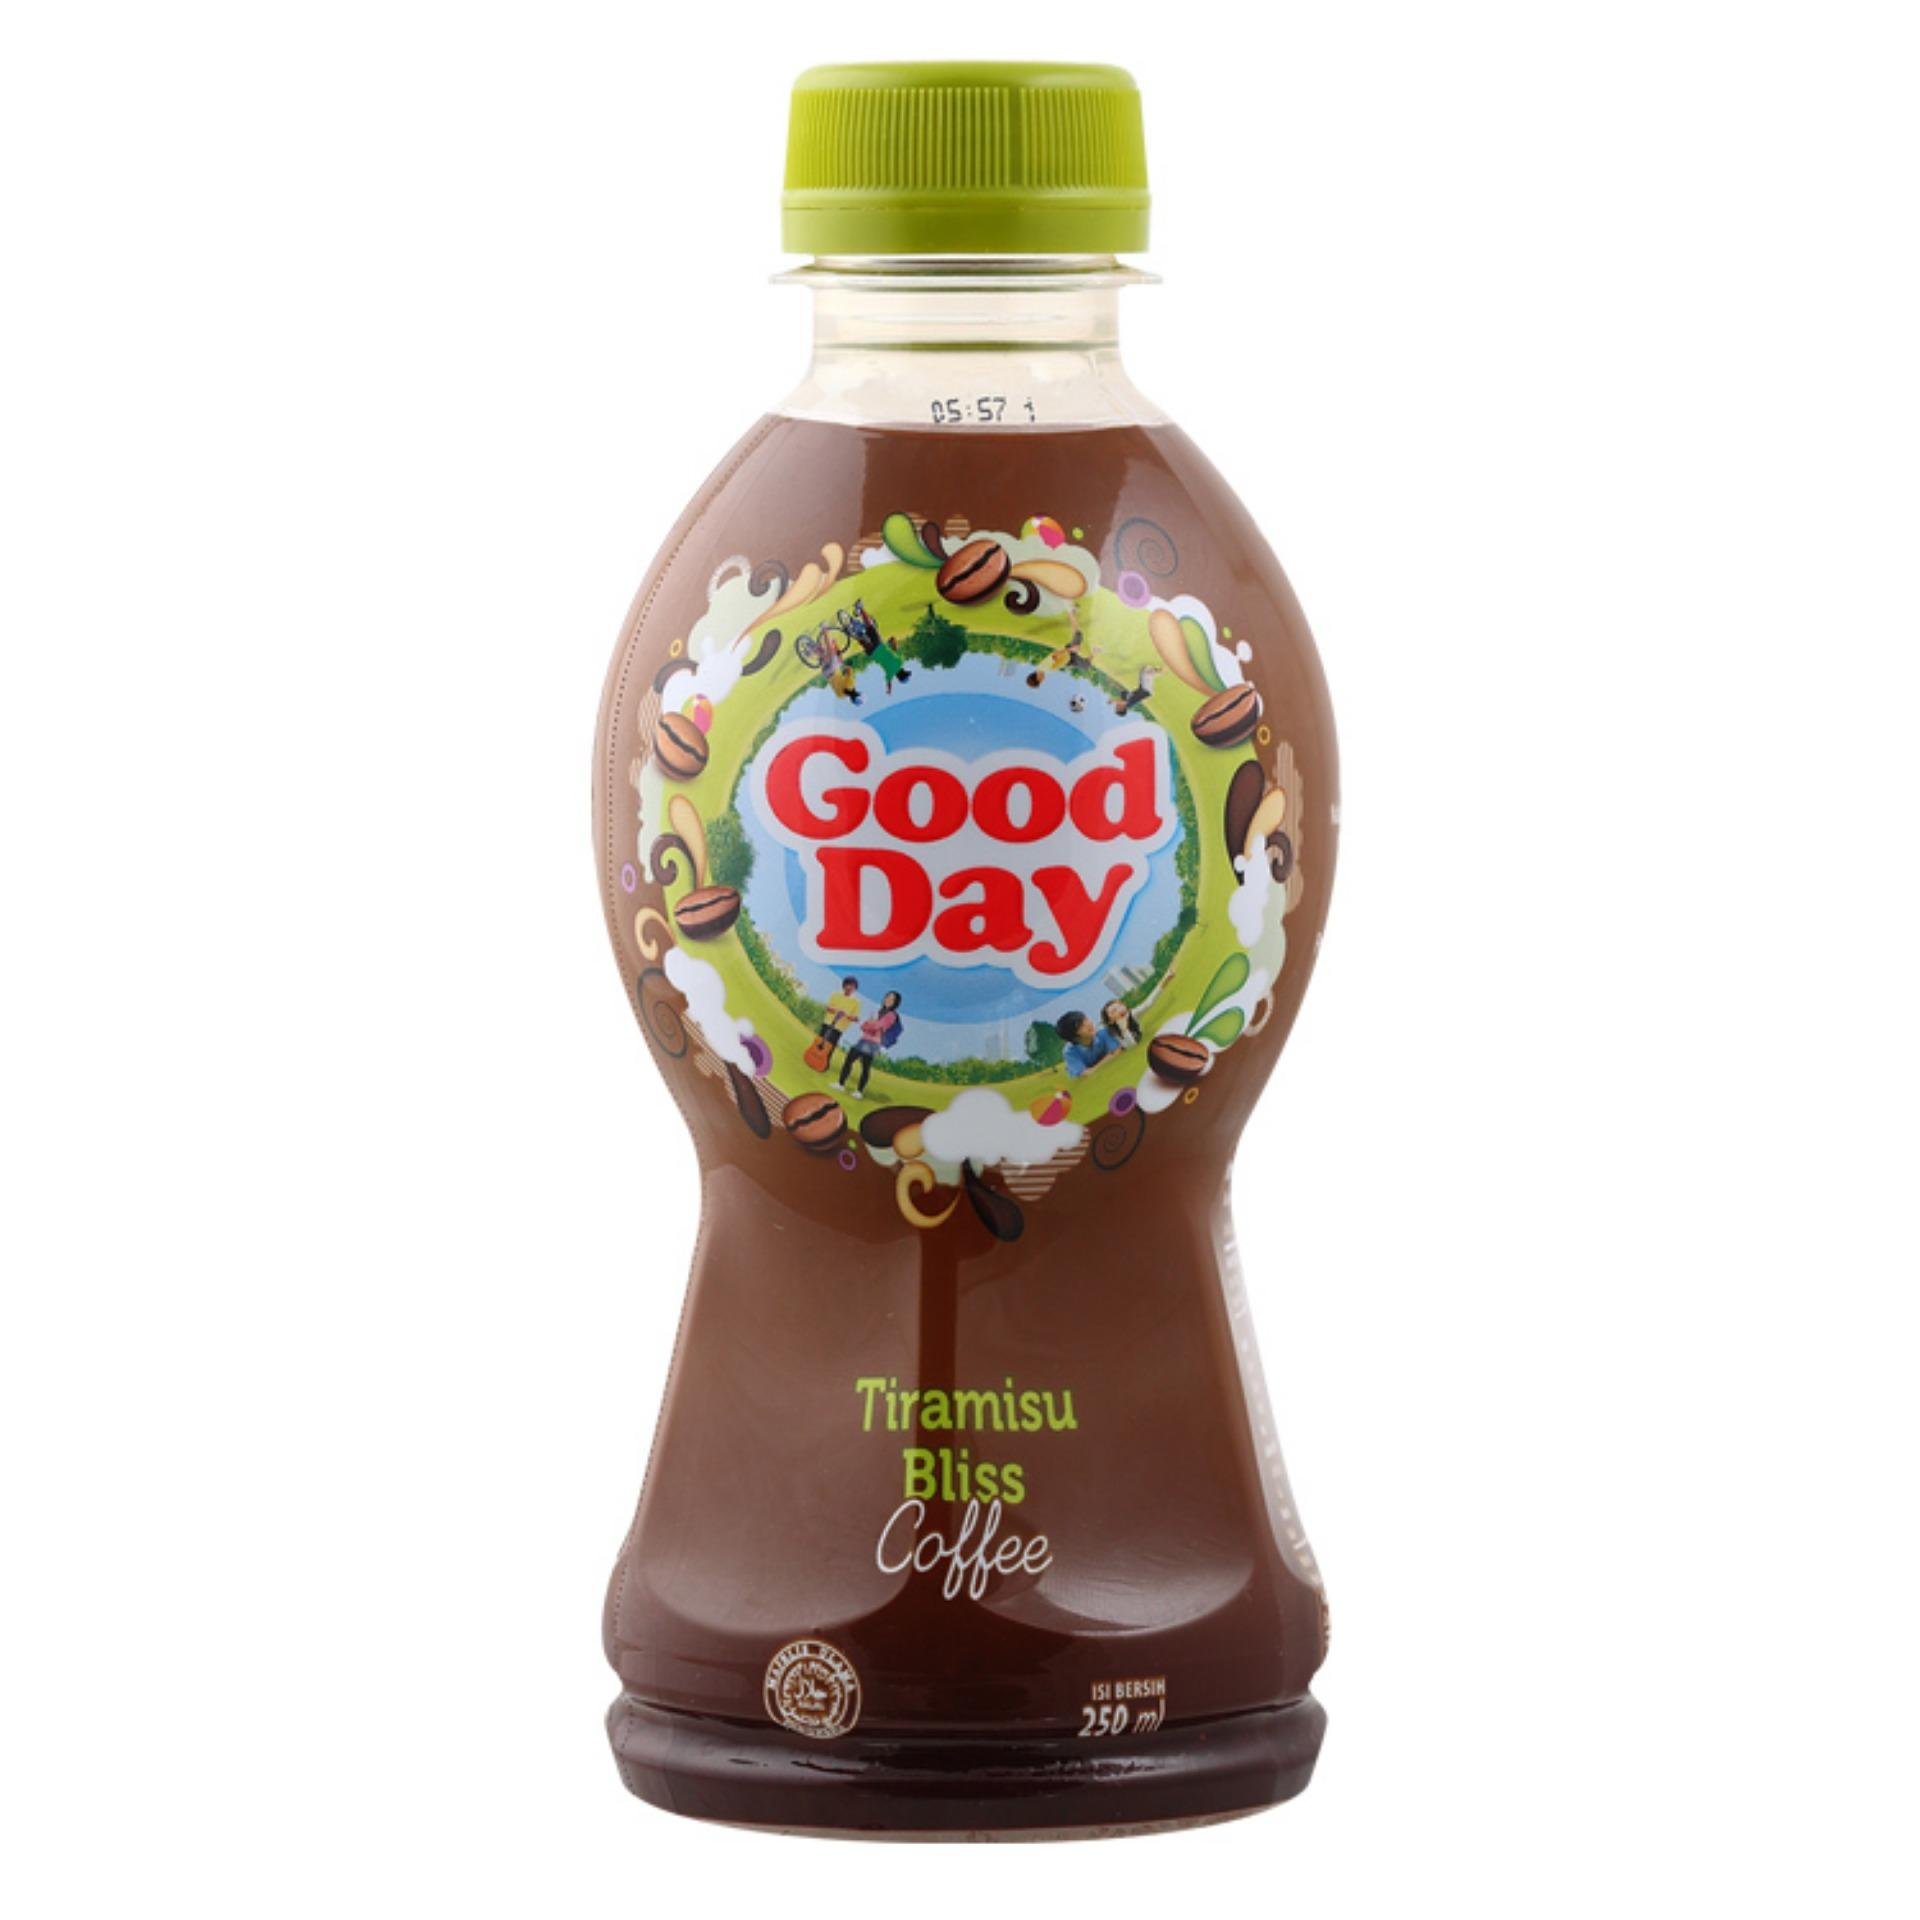 Hbt Colata Glaze Donut 250gr Cappucino Daftar Harga Terkini dan Source · Harga preferensial Good Day Kopi Ready To Drink PET Tiramisu Bliss 250ml Pack of 6 ...